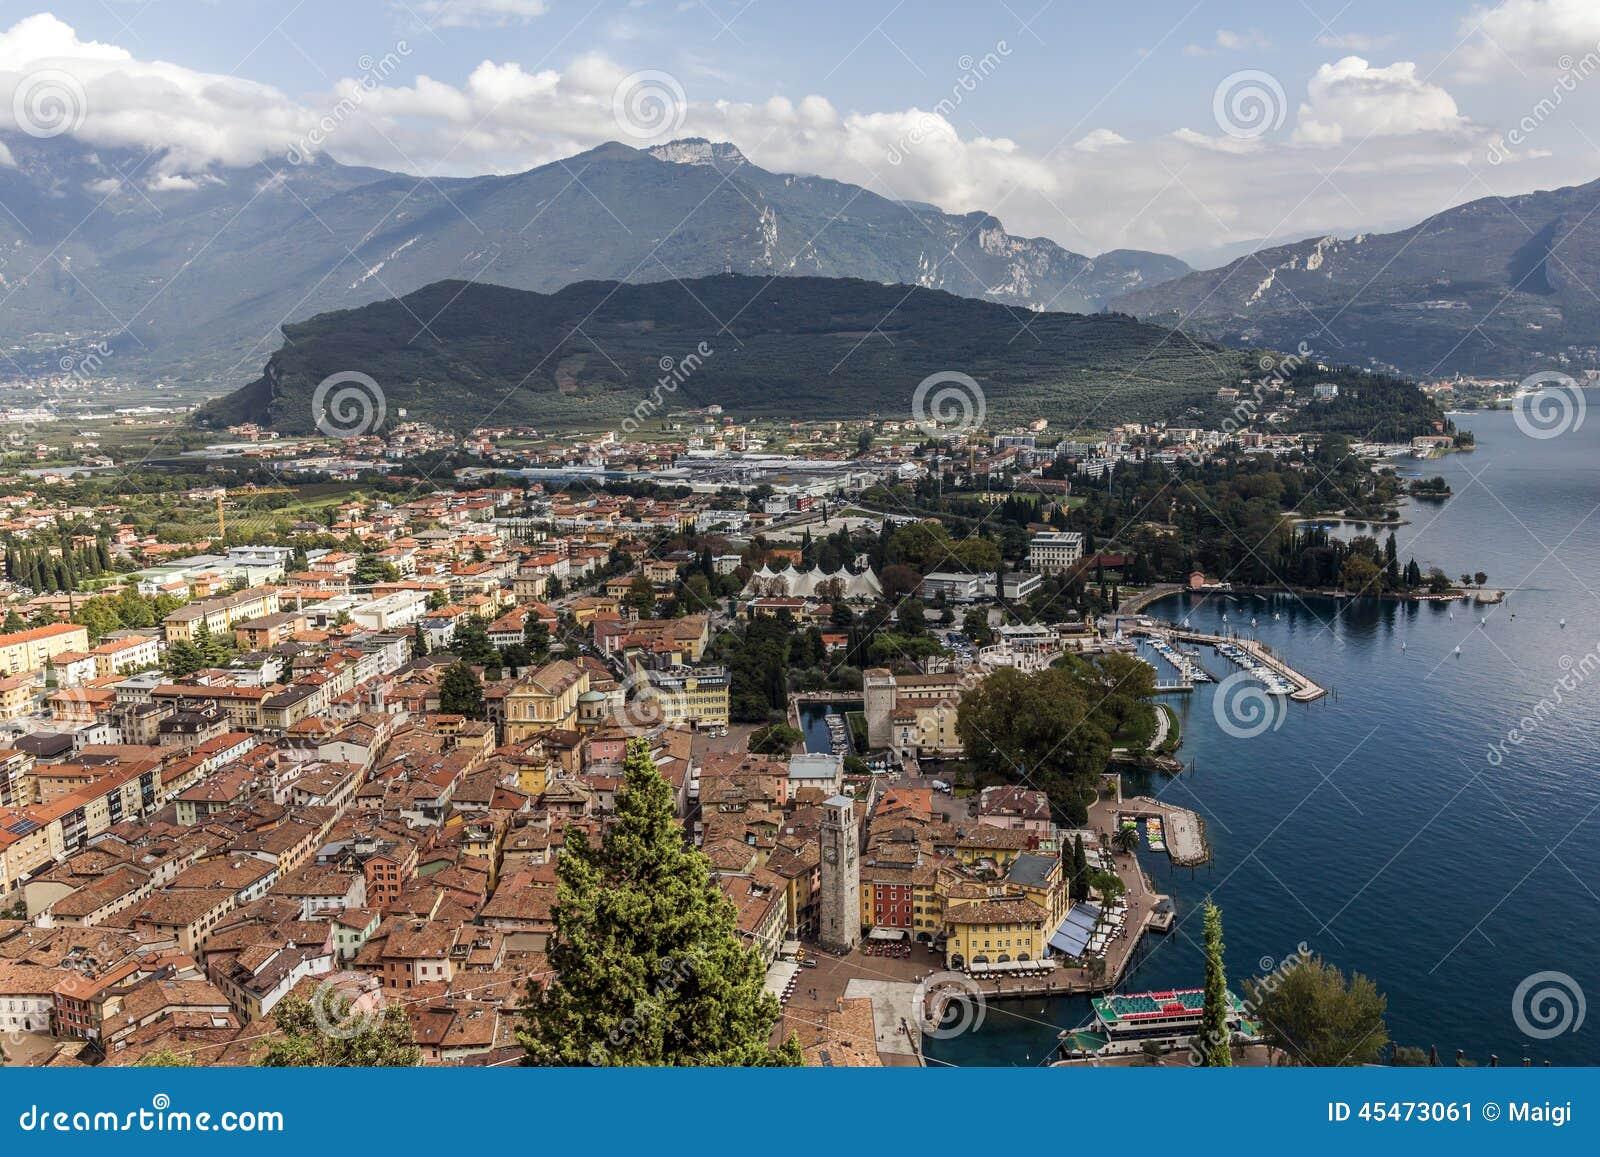 Download Riva Del Garda By Garda Lake Stock Image - Image of clouds, view: 45473061